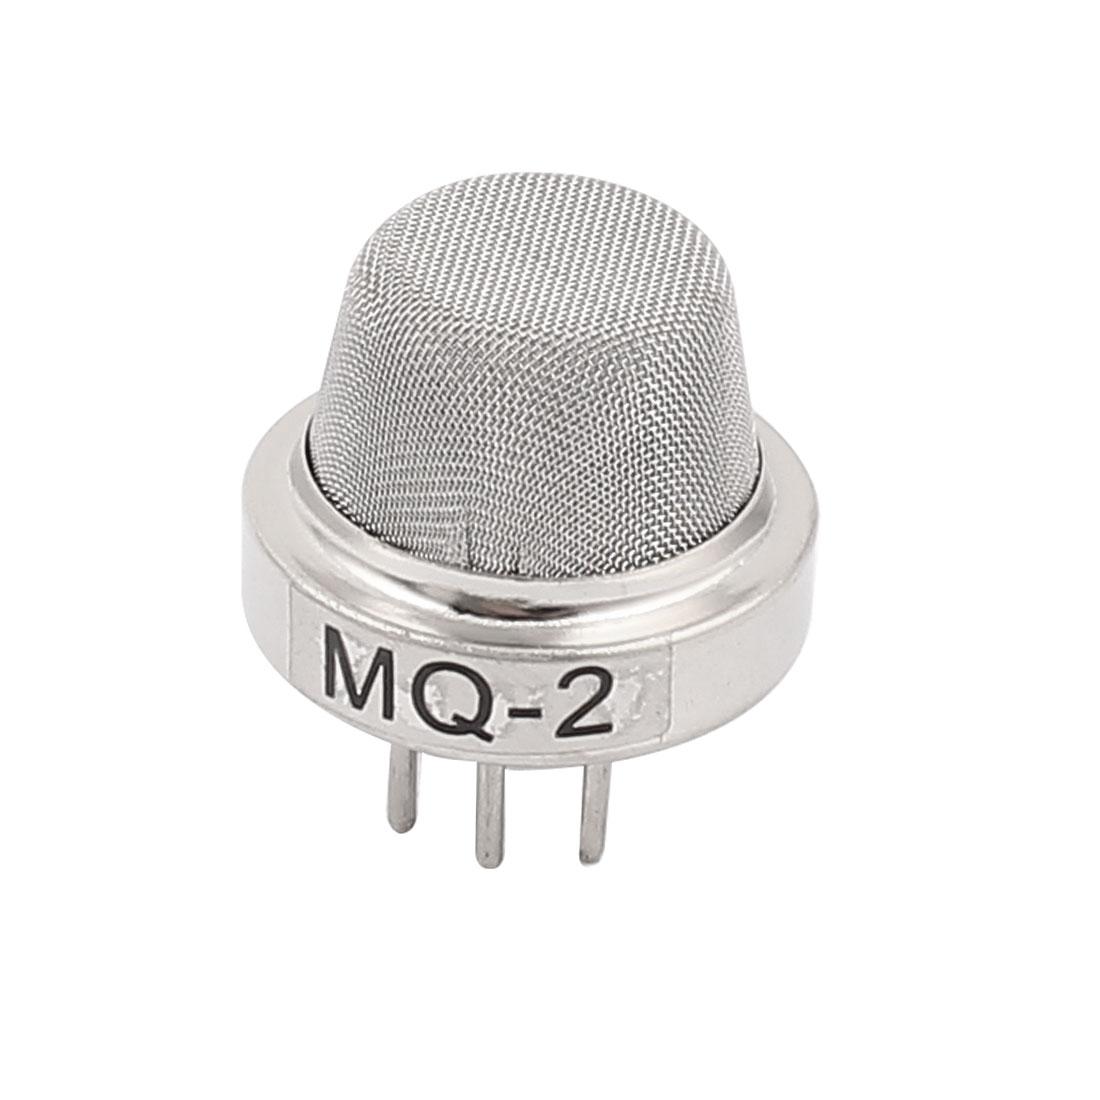 MQ-2 MQ2 Butane Hydrogen Smoke Gas Detecting Sensor 6P 6 Pin DC 5V